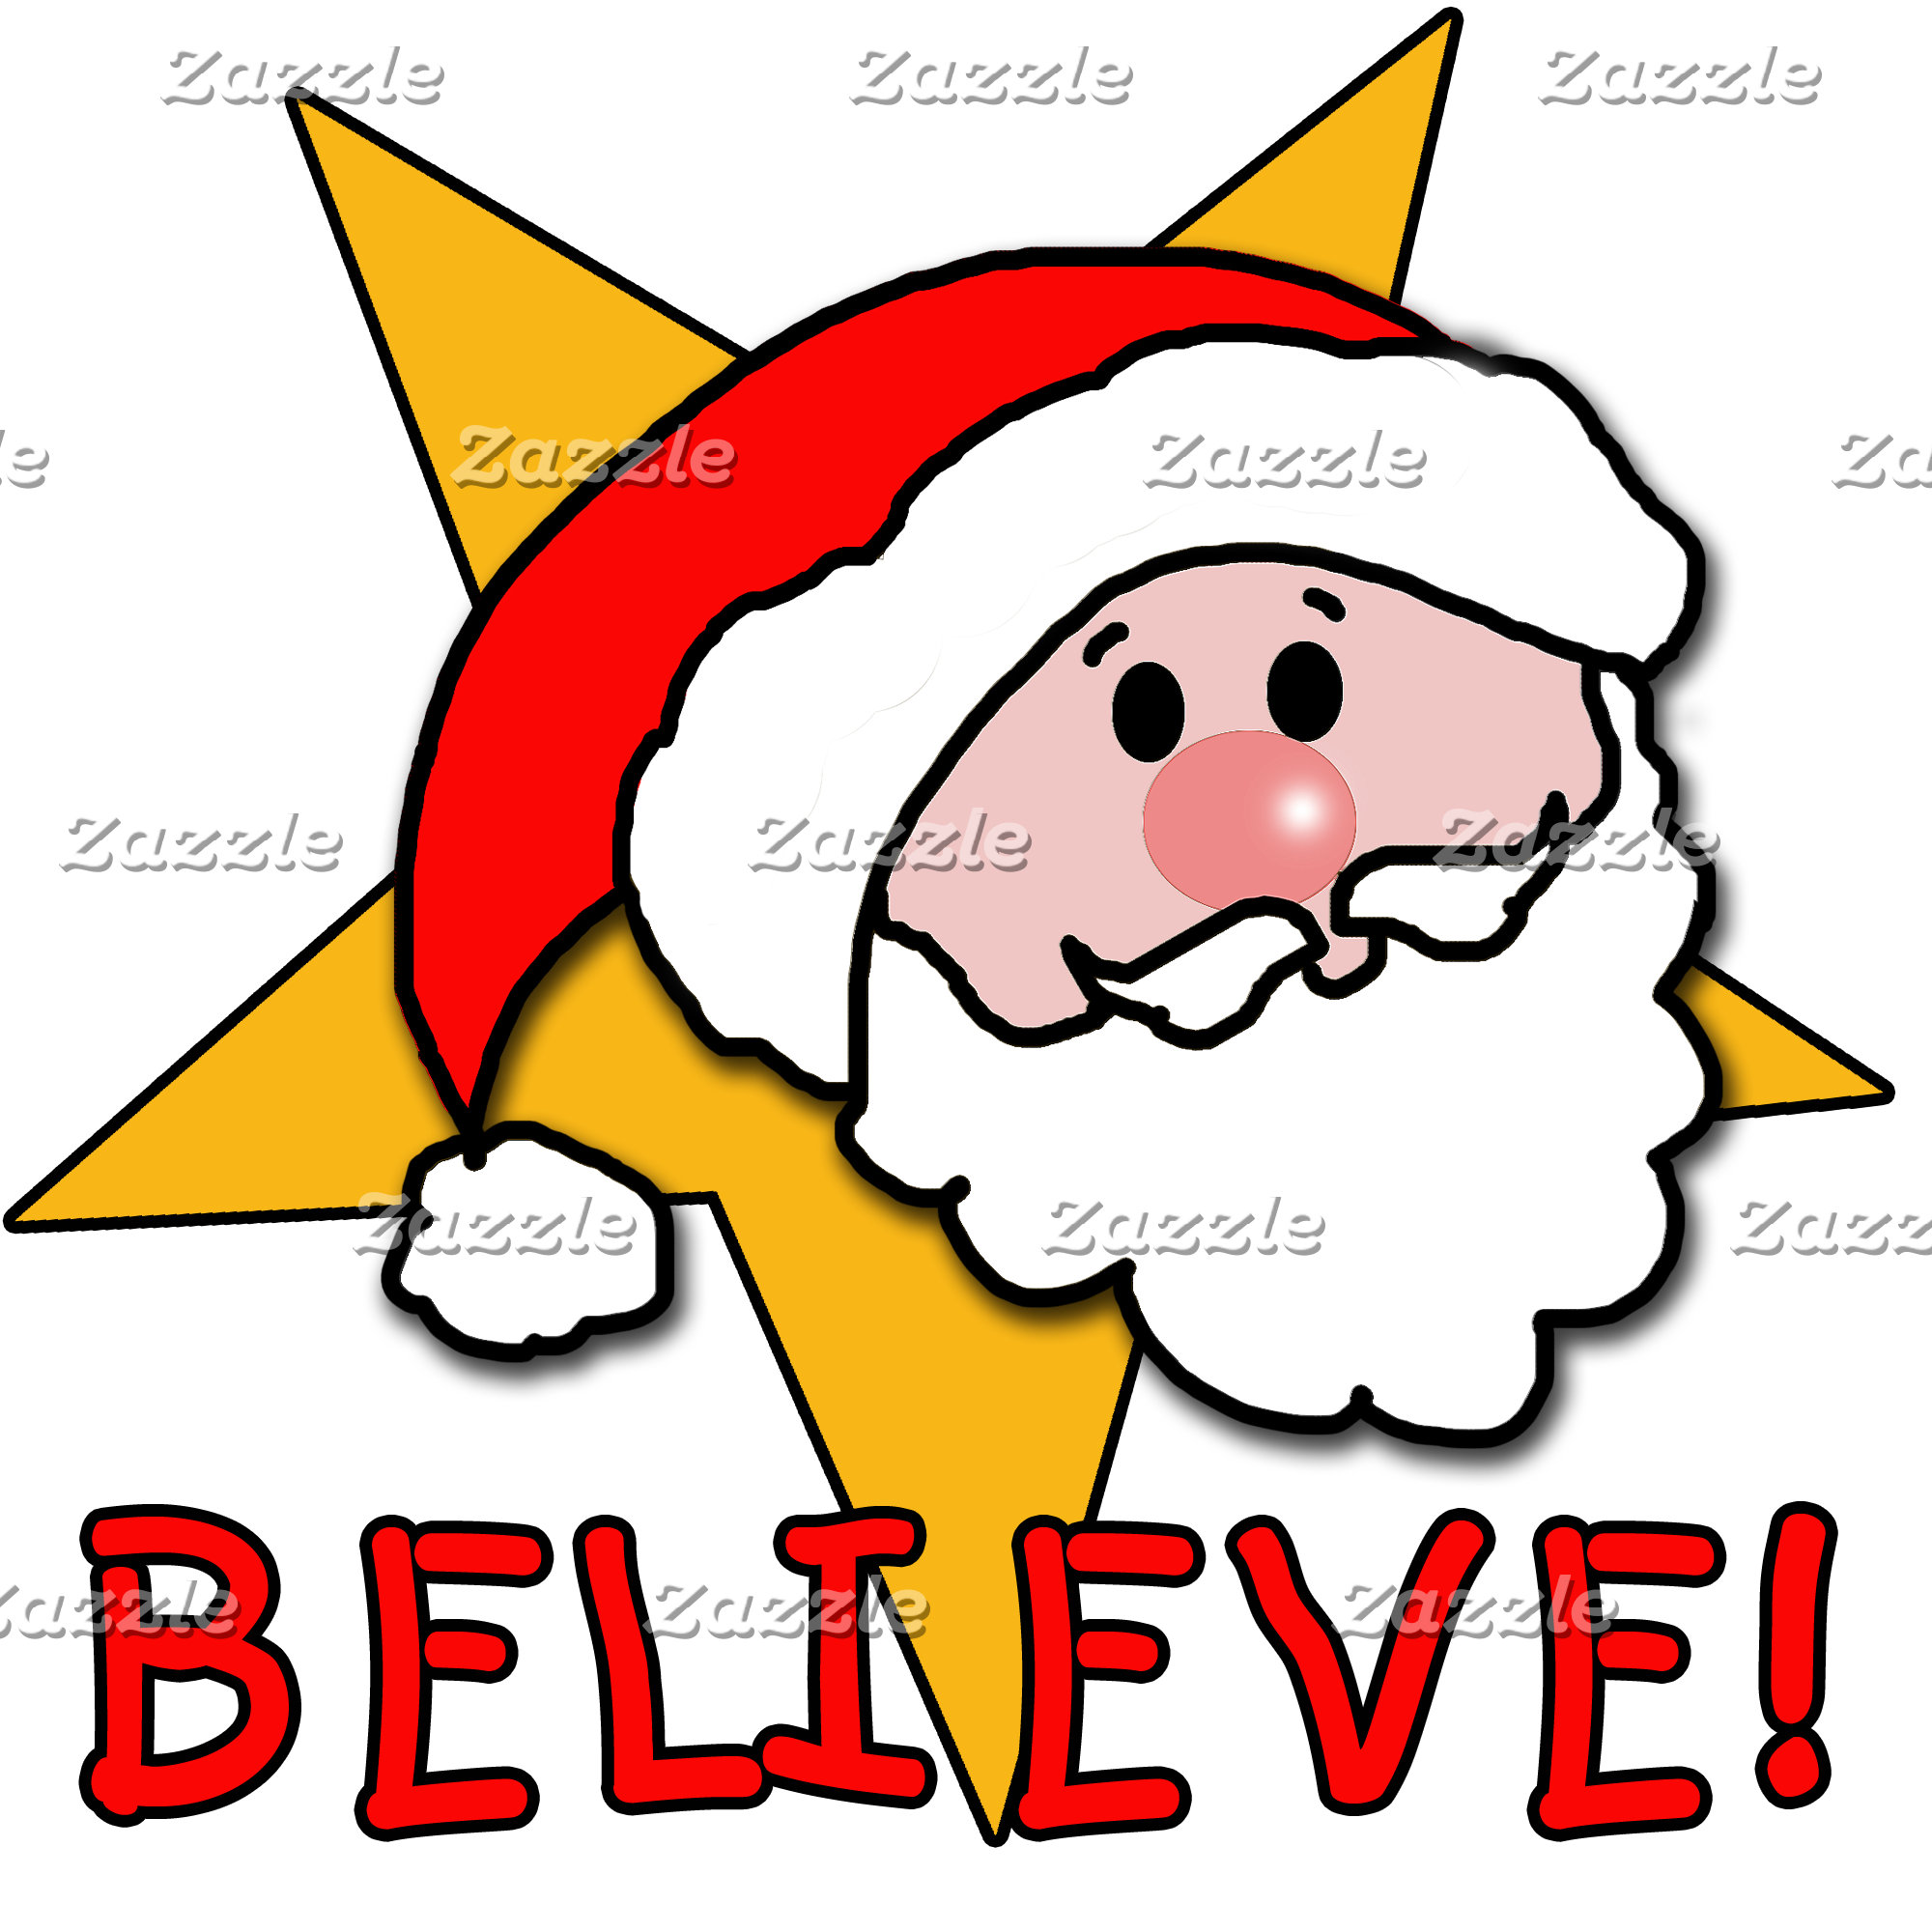 Christmas, Hanukkah, Winter Holidays